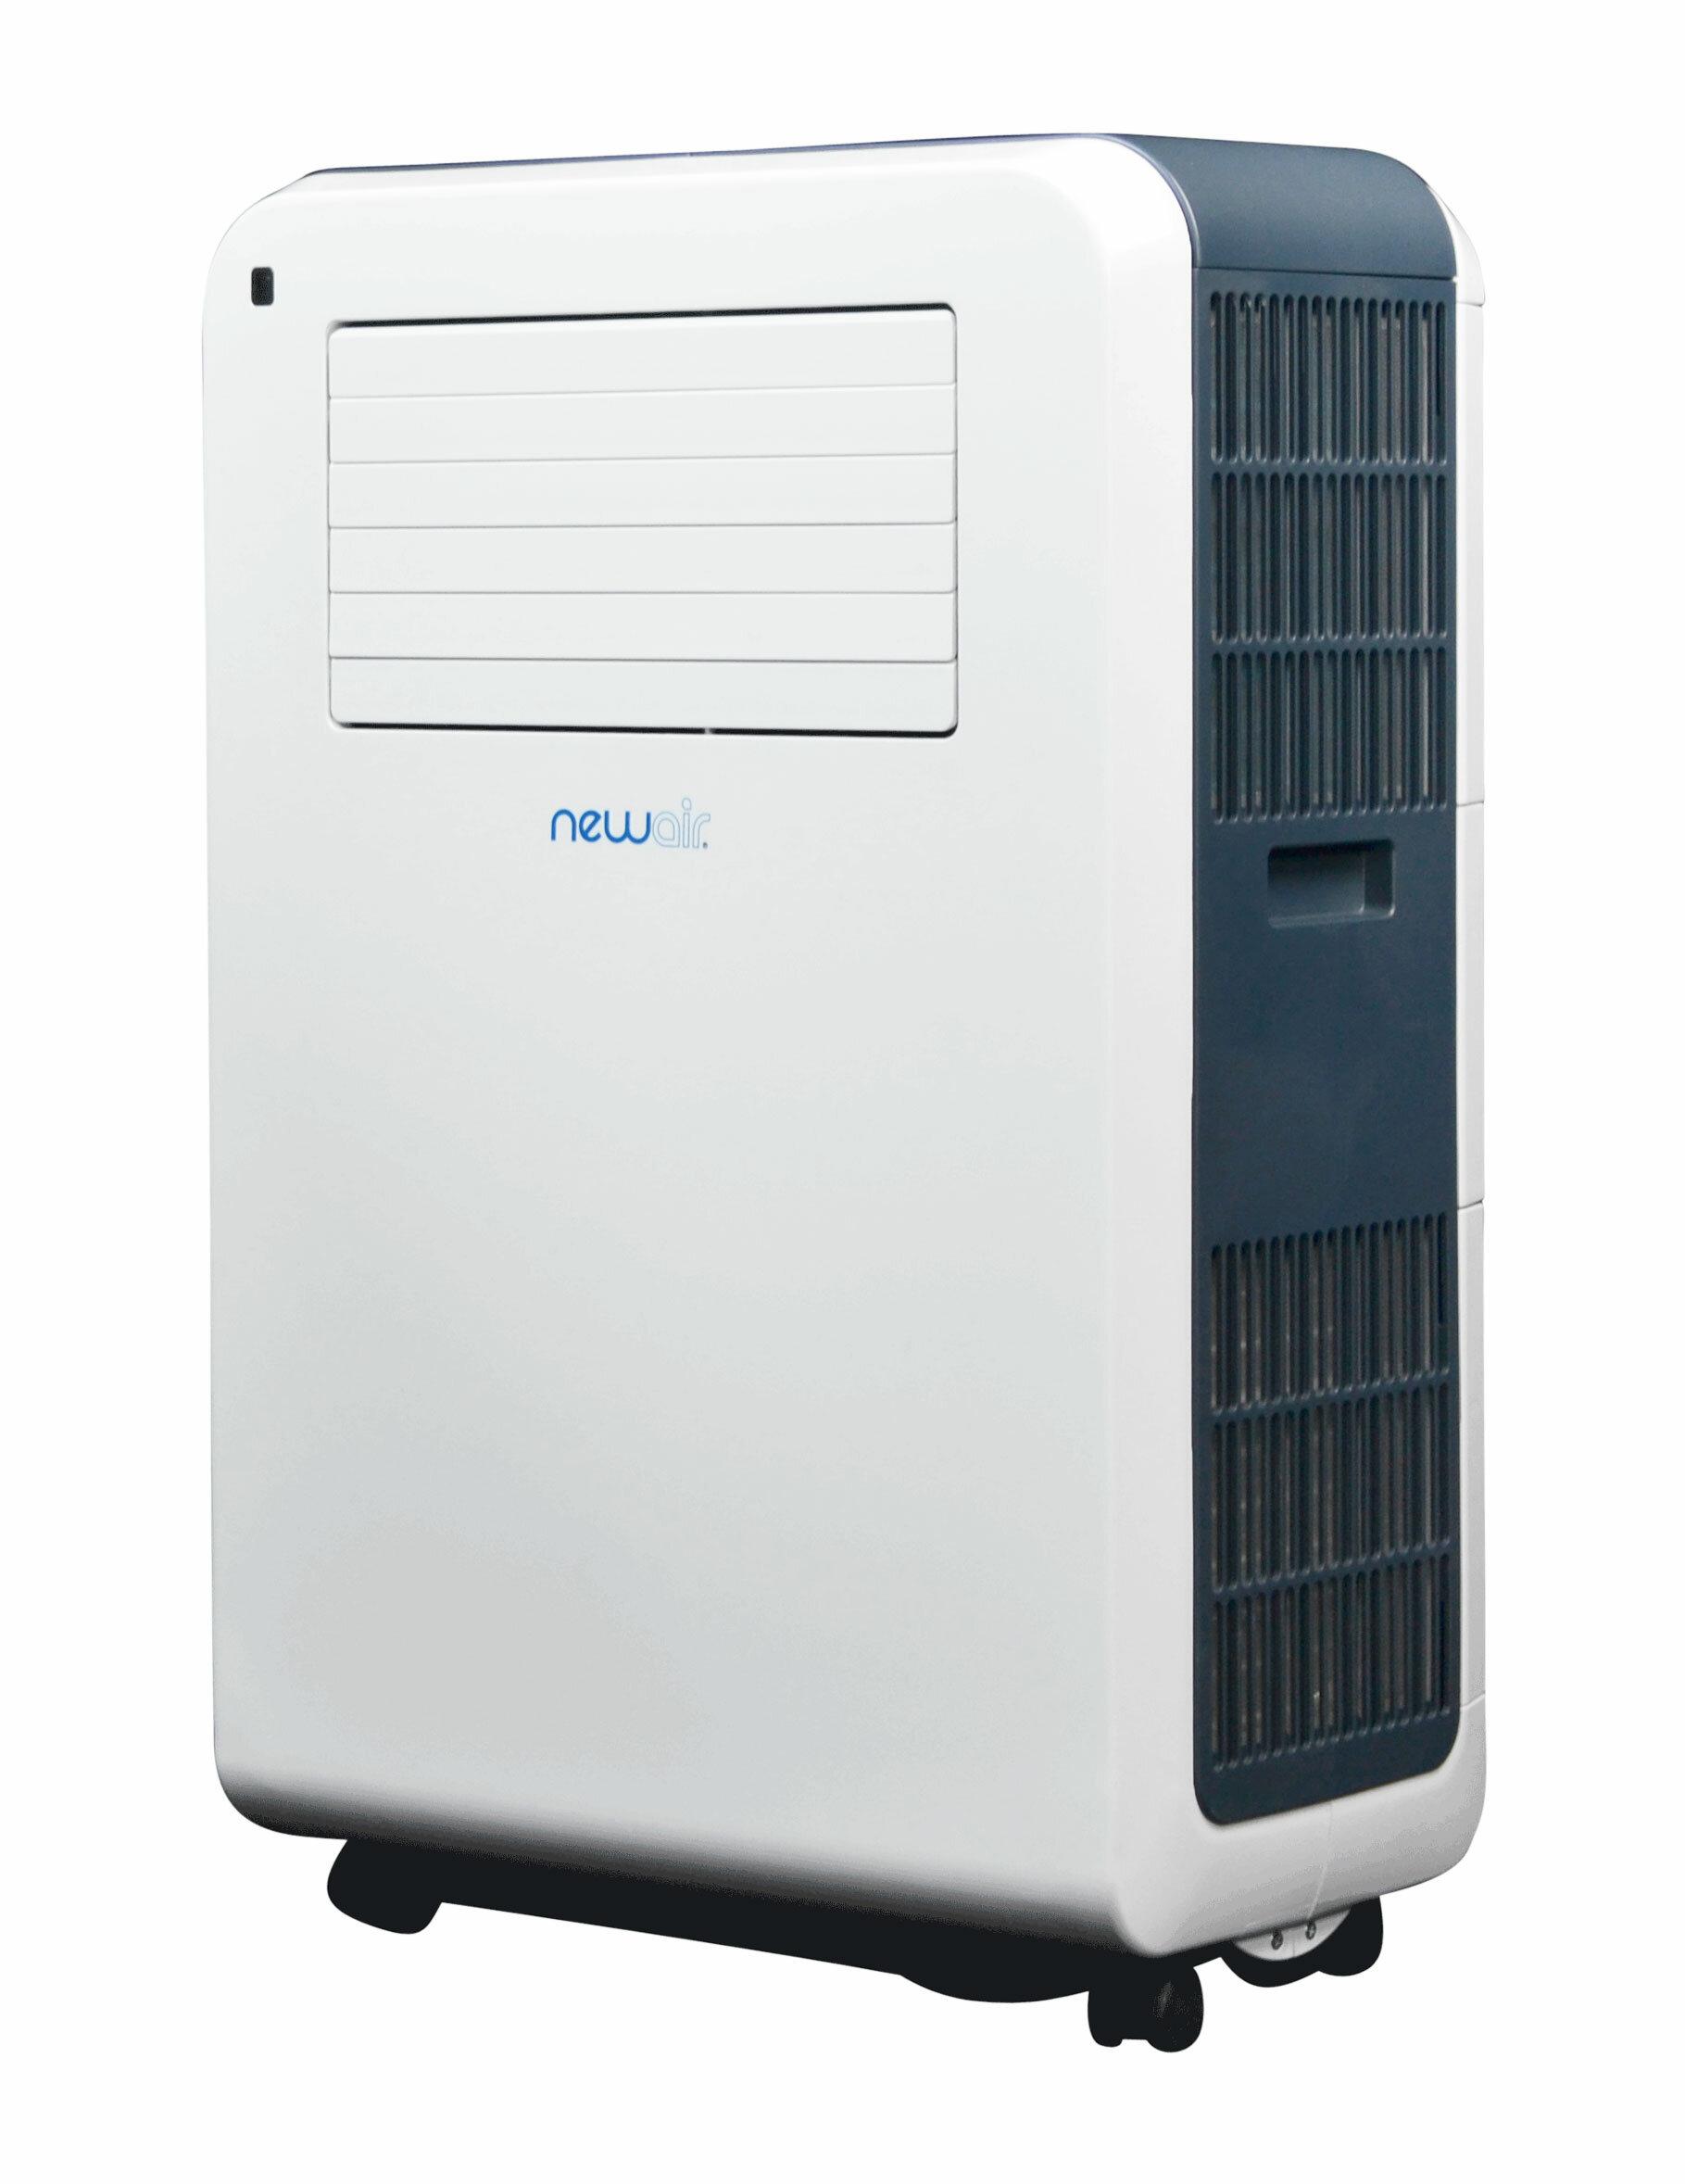 Bon NewAir 12,000 BTU Portable Air Conditioner With Remote | Wayfair